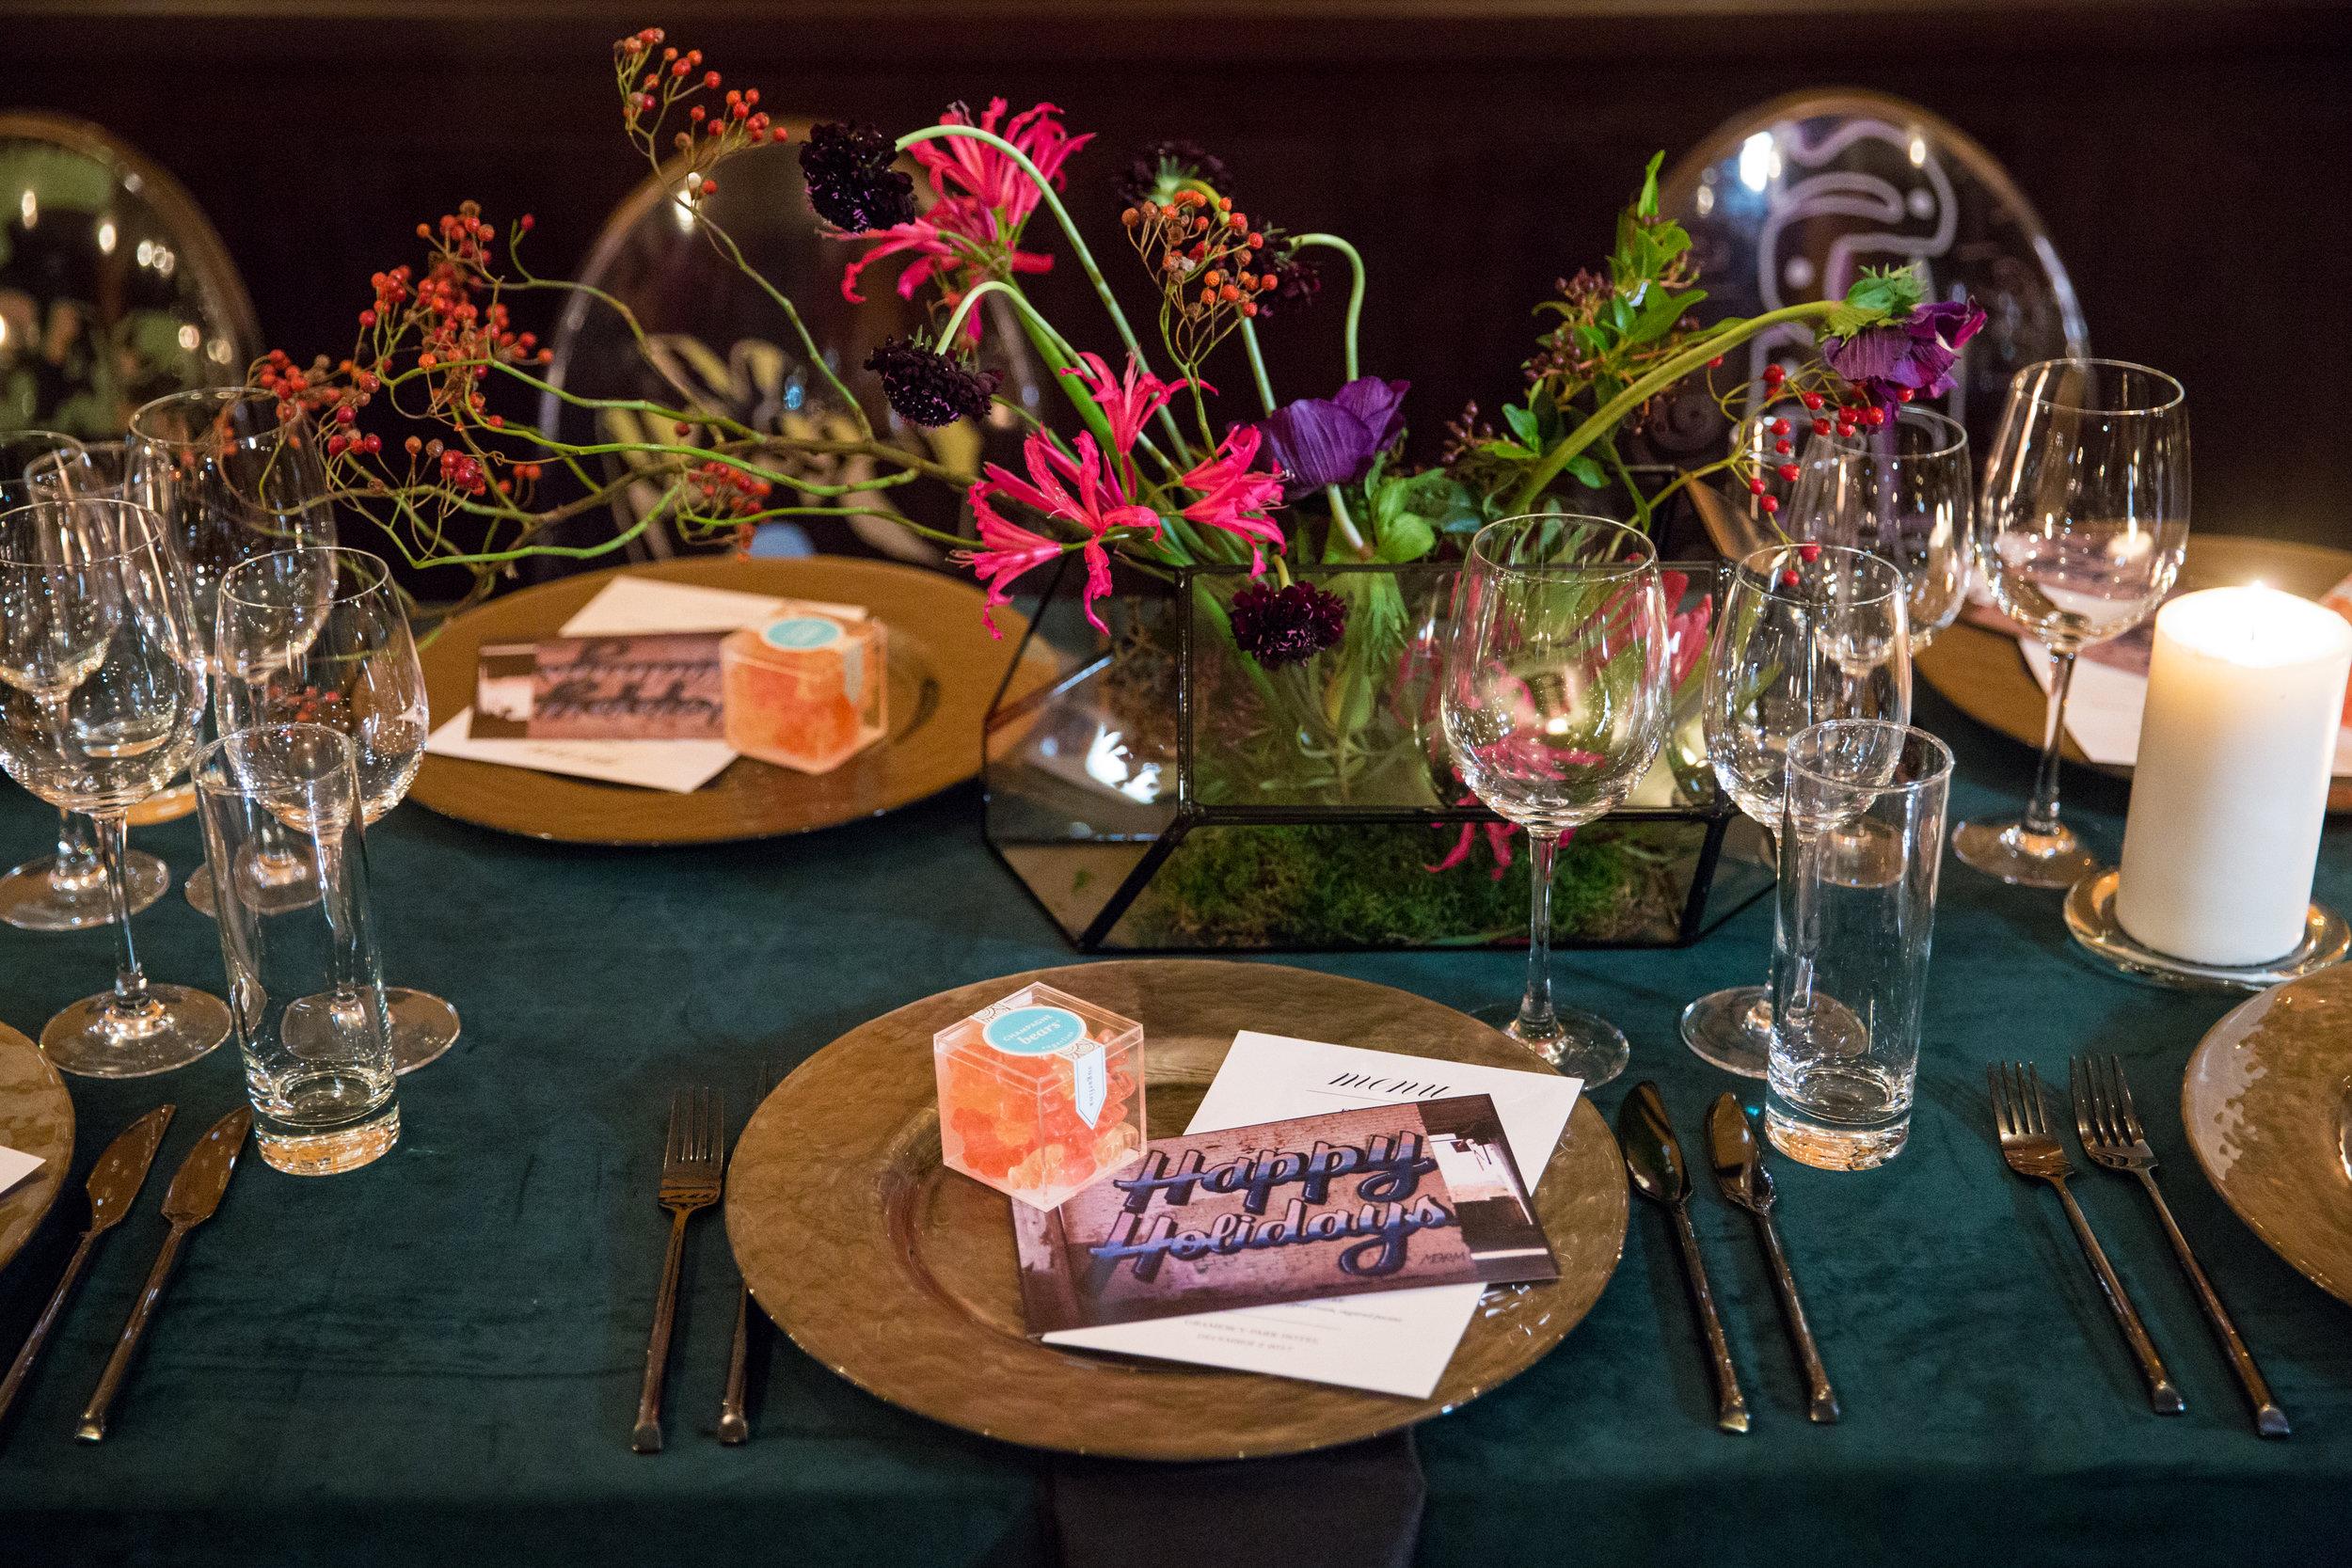 Gramercy-Park-Hotel-Holiday-Party-Andrea-Freeman-Events-3.JPG